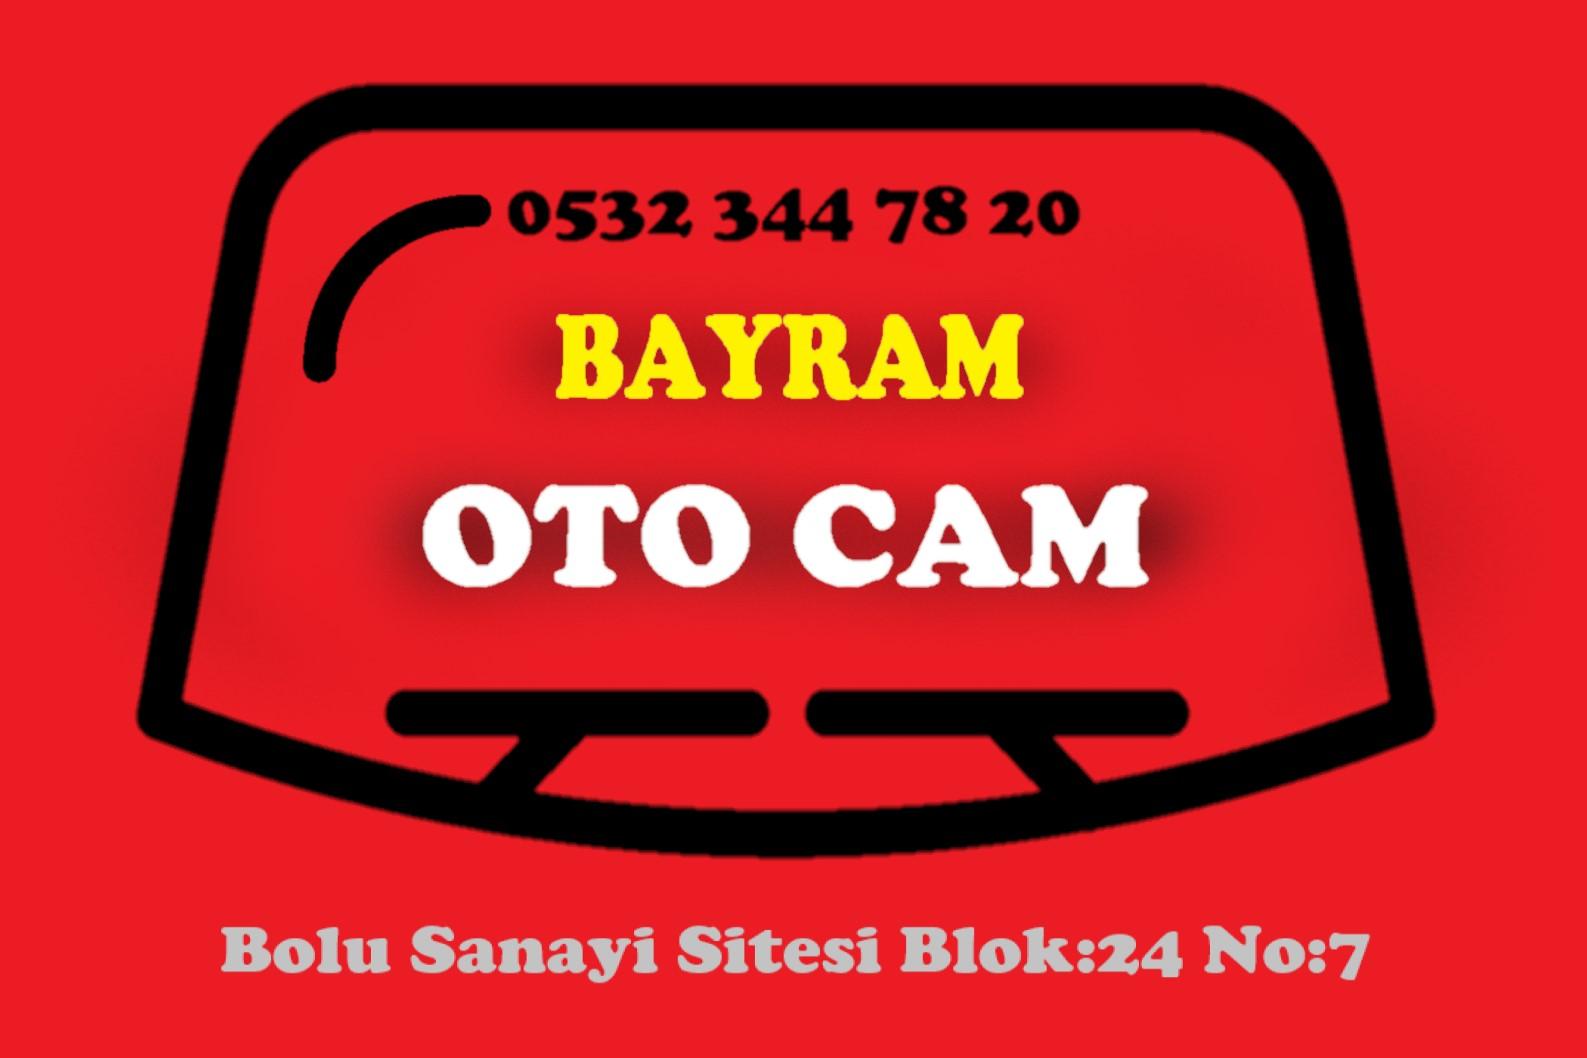 Bayram Oto Cam